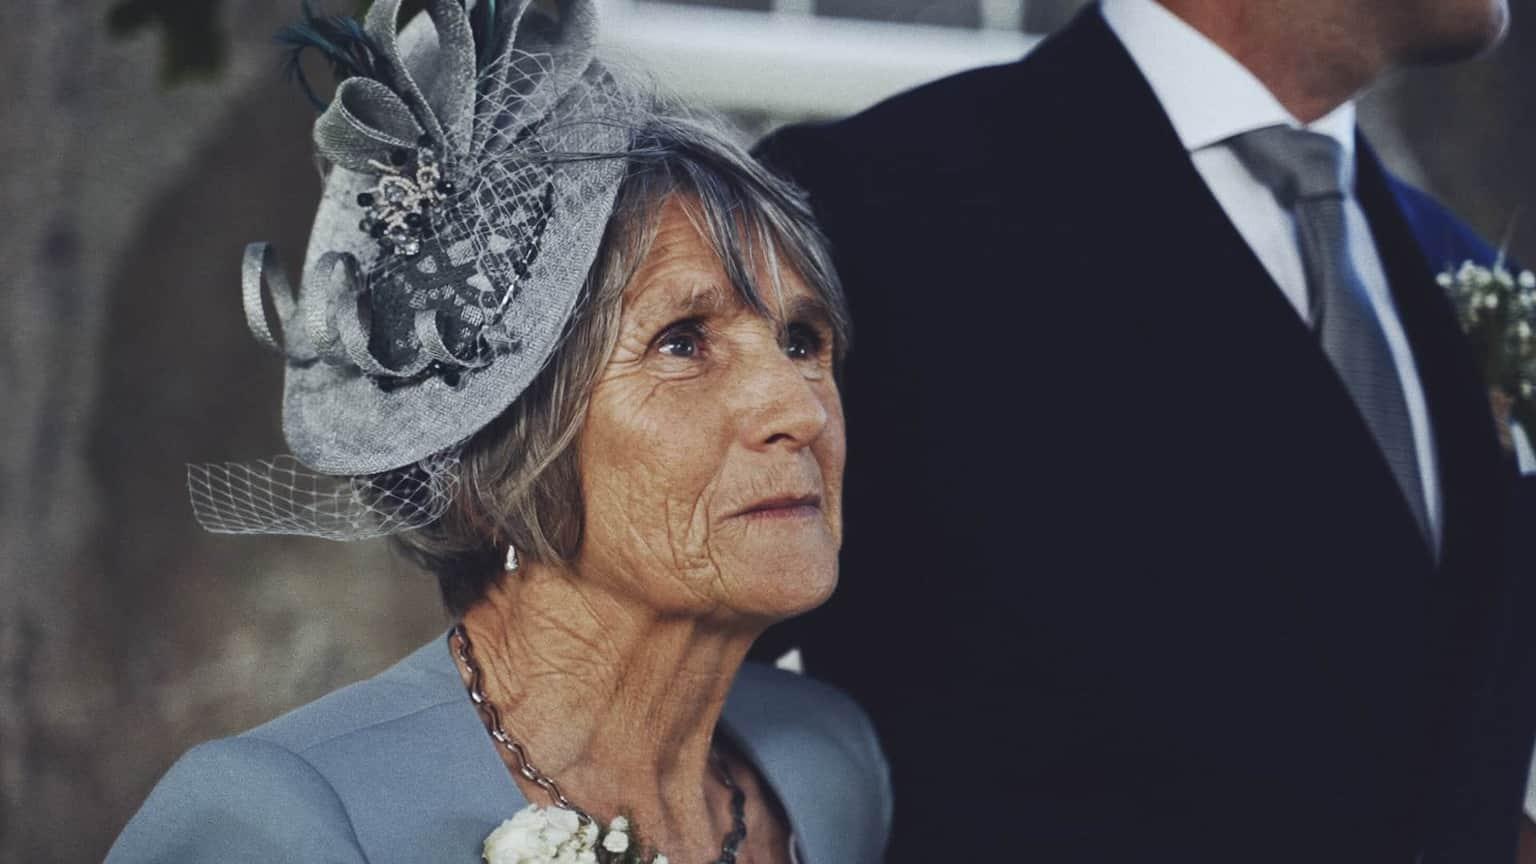 Mom of bride looking in future.